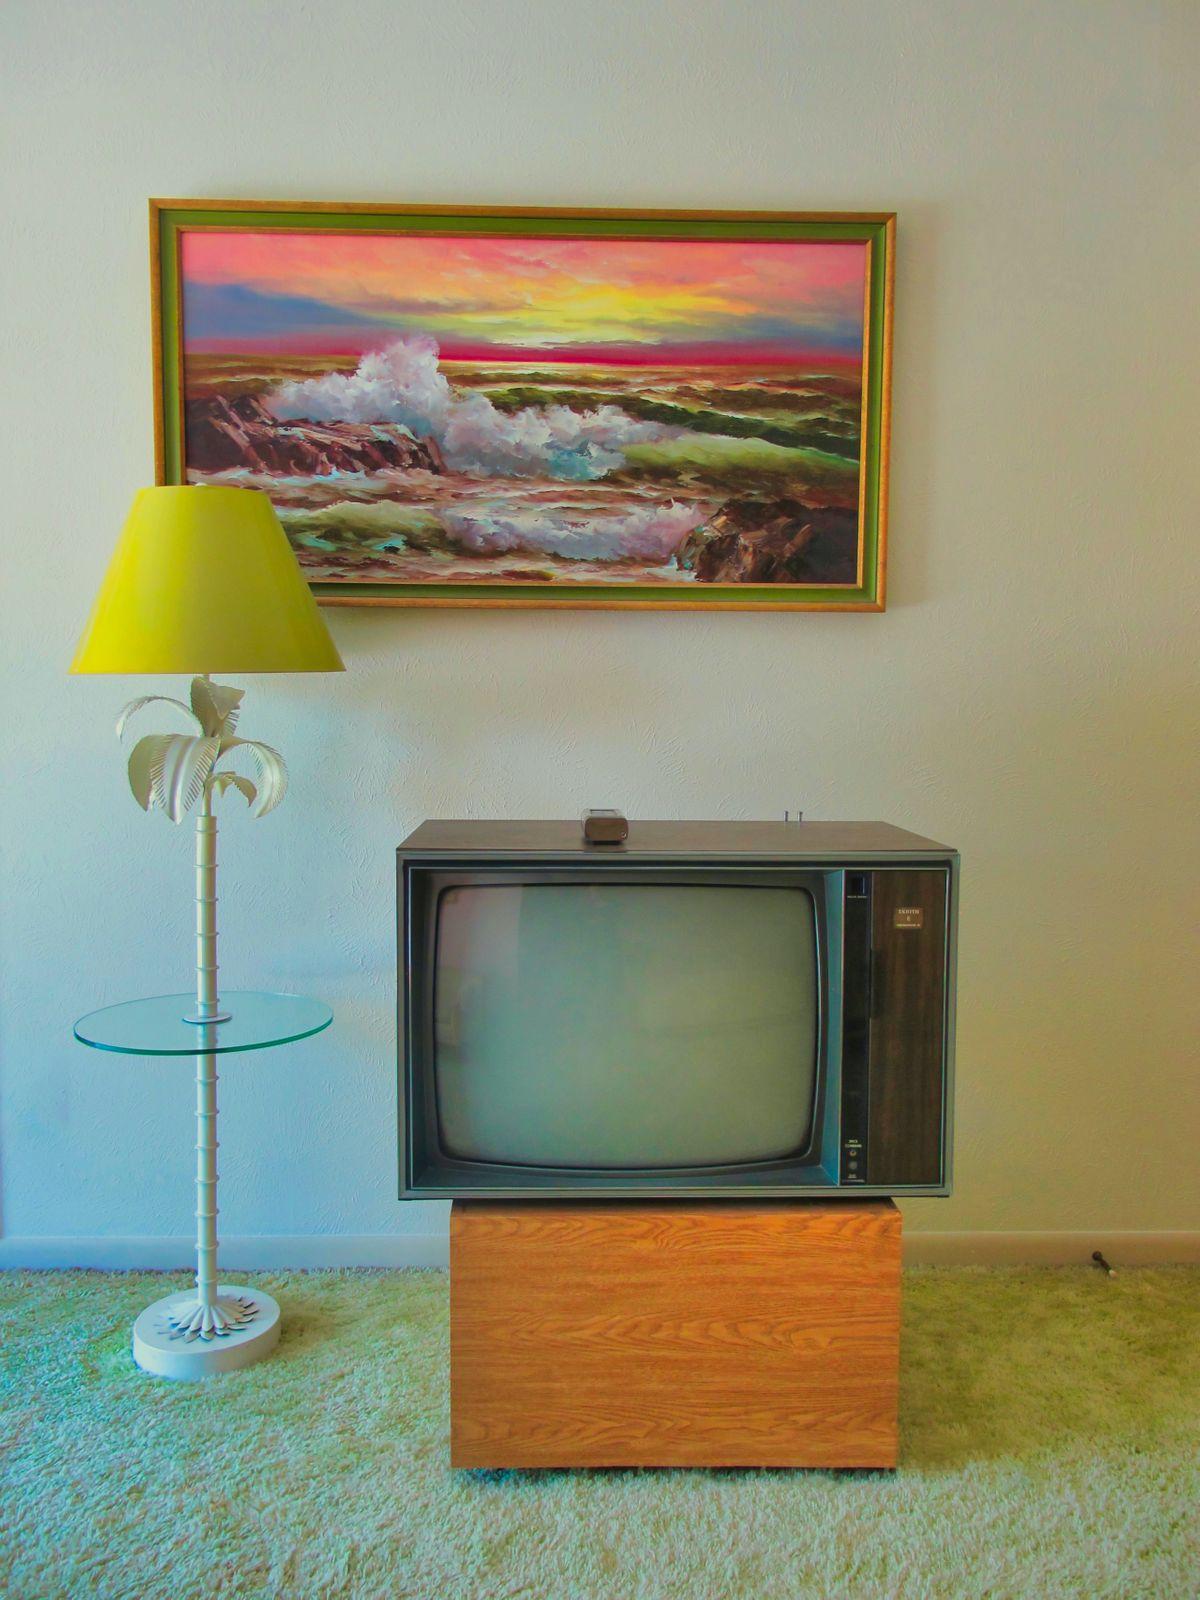 Shagplace Mid Century Modern Home Photo Video Shoot Location Dallas68.jpeg